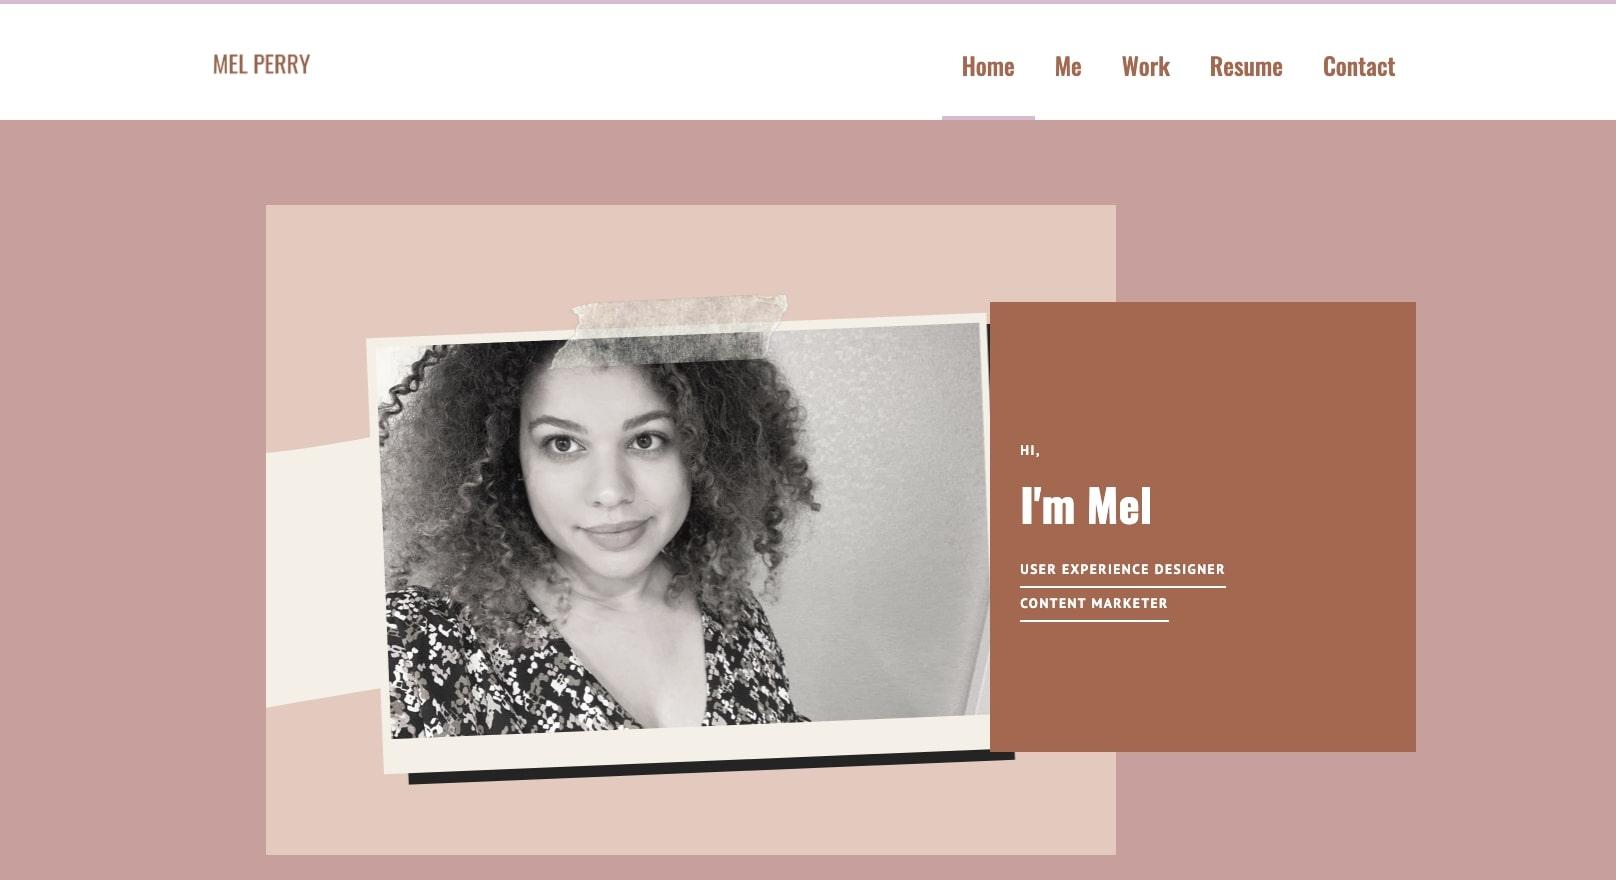 mel's online portfolio